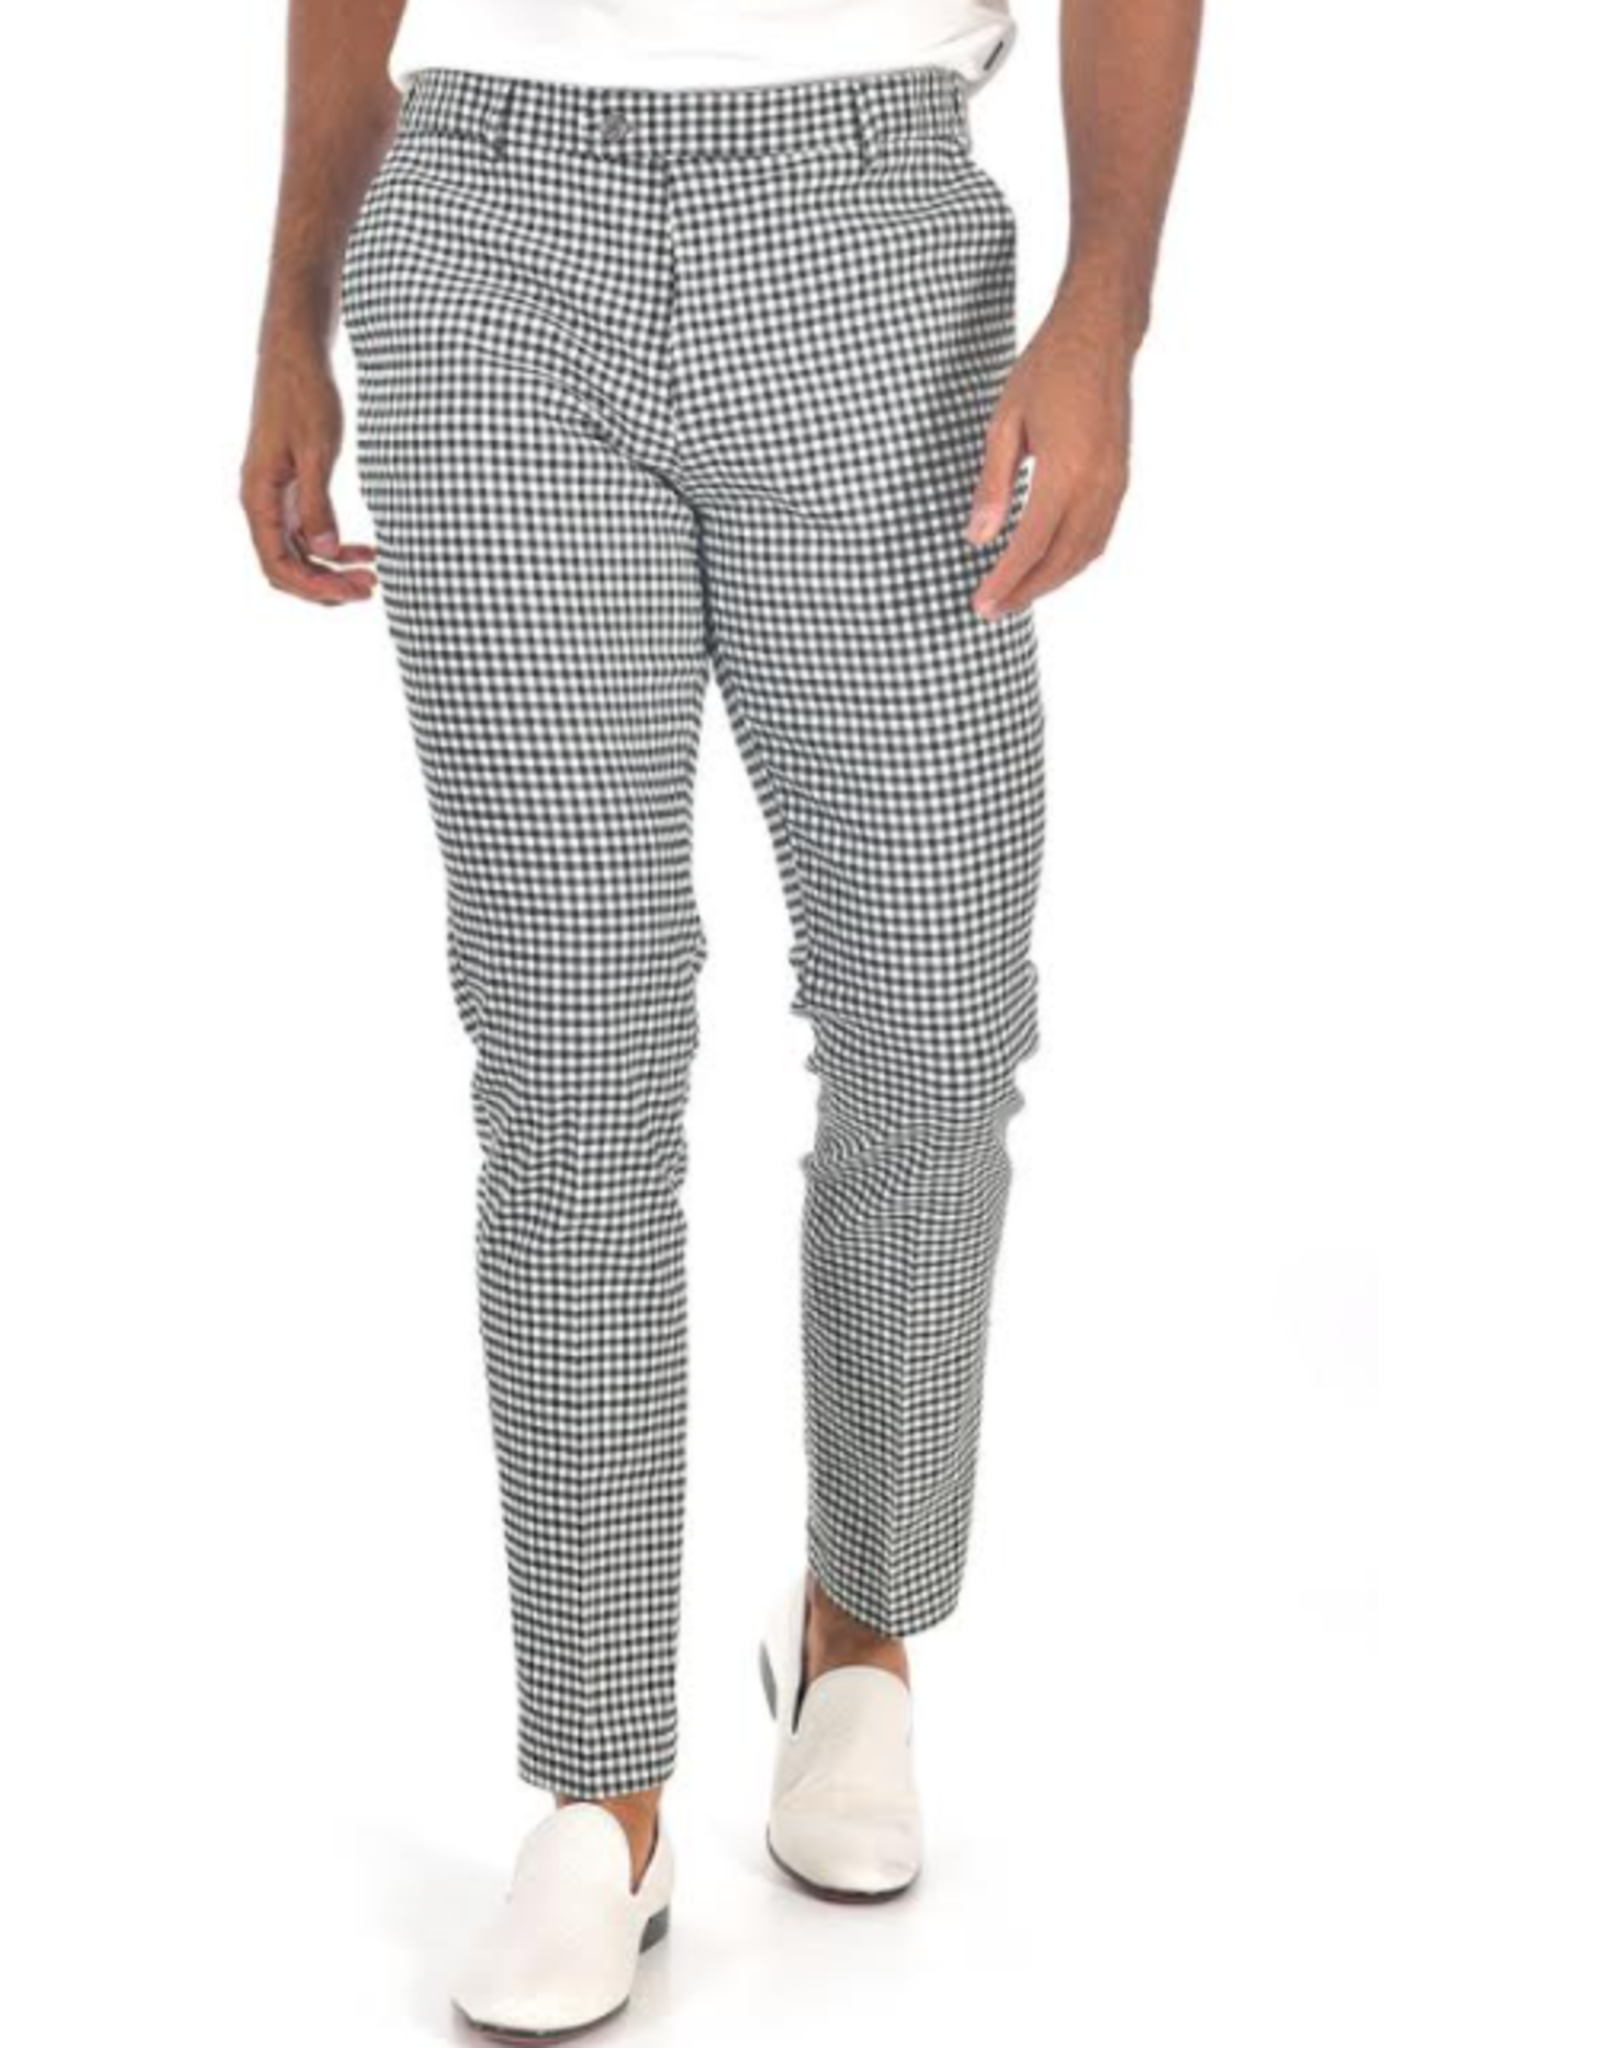 Barabas Barabas Slim Fit Pant - CP92 Black & White Houndstooth